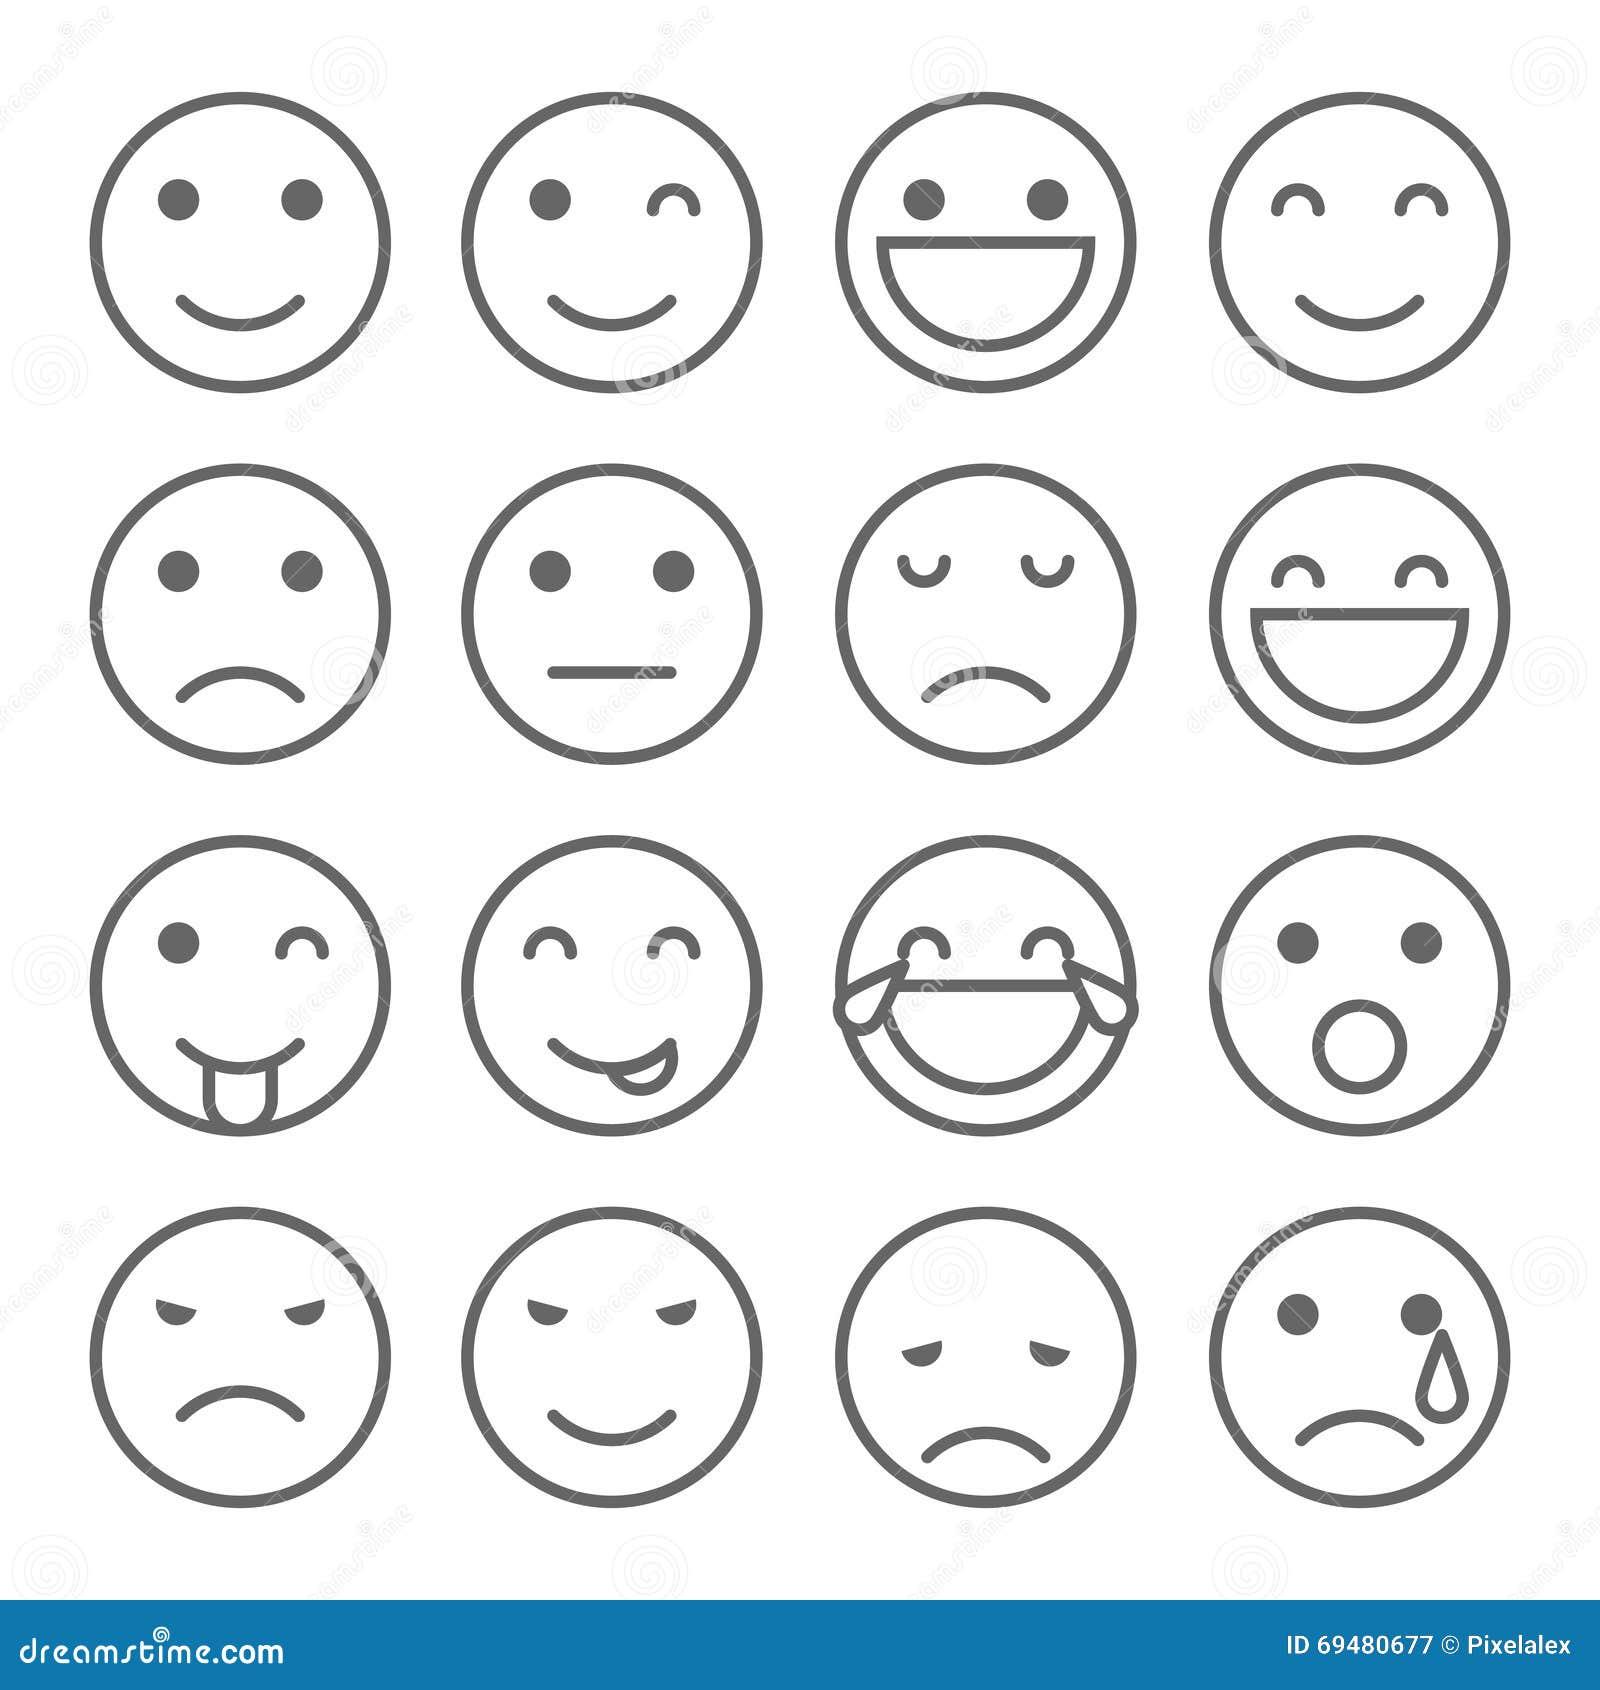 Emoji Faces Simple Icons Stock Illustration Image 69480677